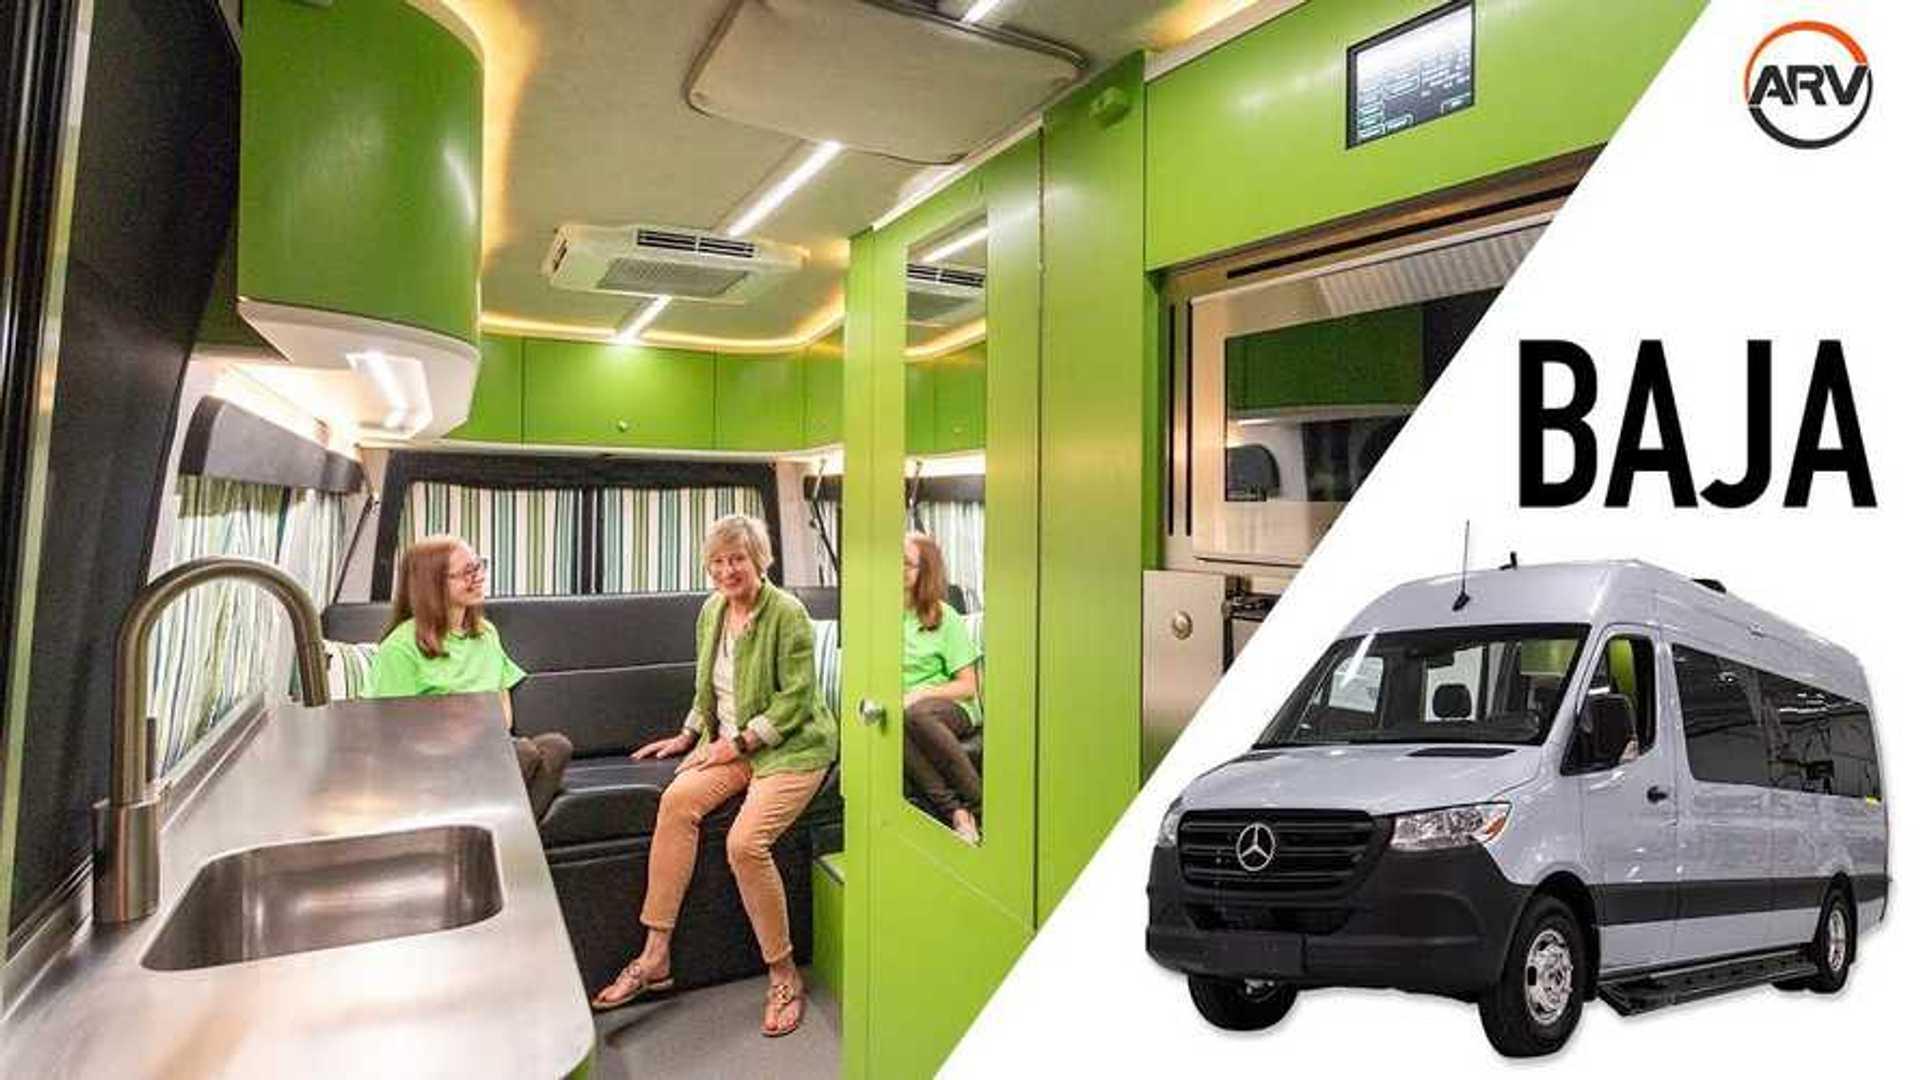 Advanced RV Baja Is The Greenest Camper Van We've Ever Seen